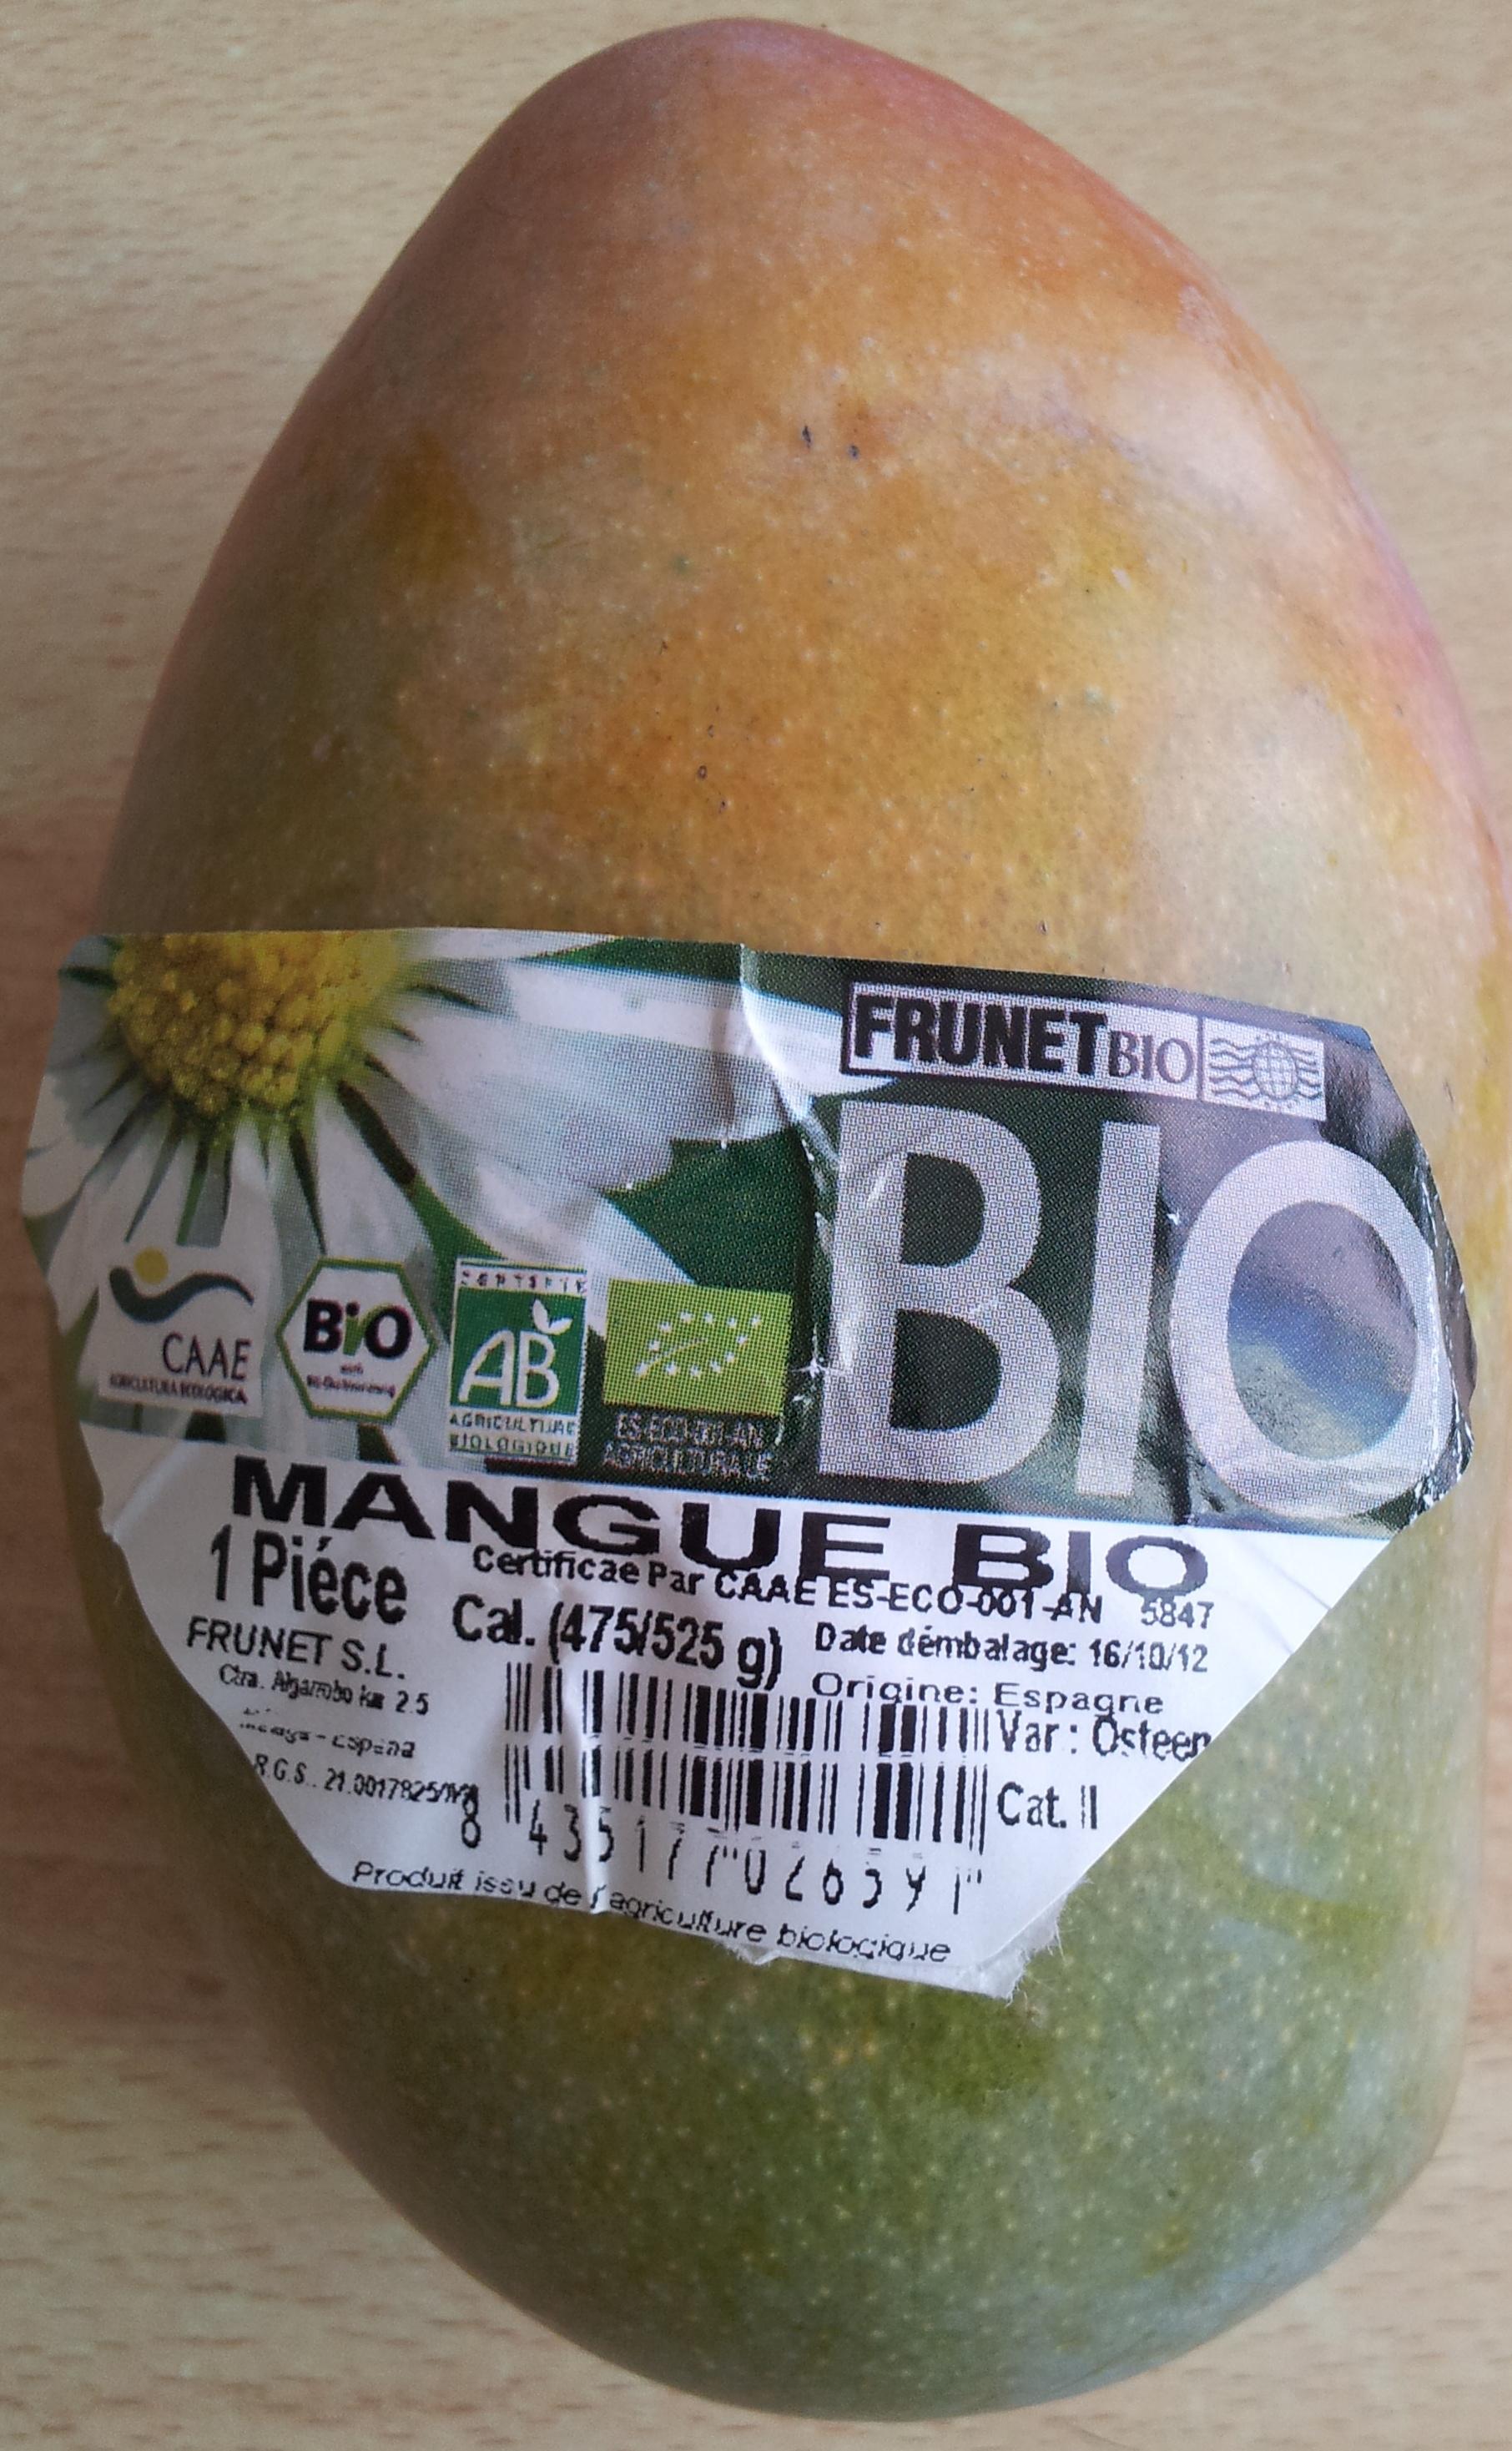 Mangue bio - Product